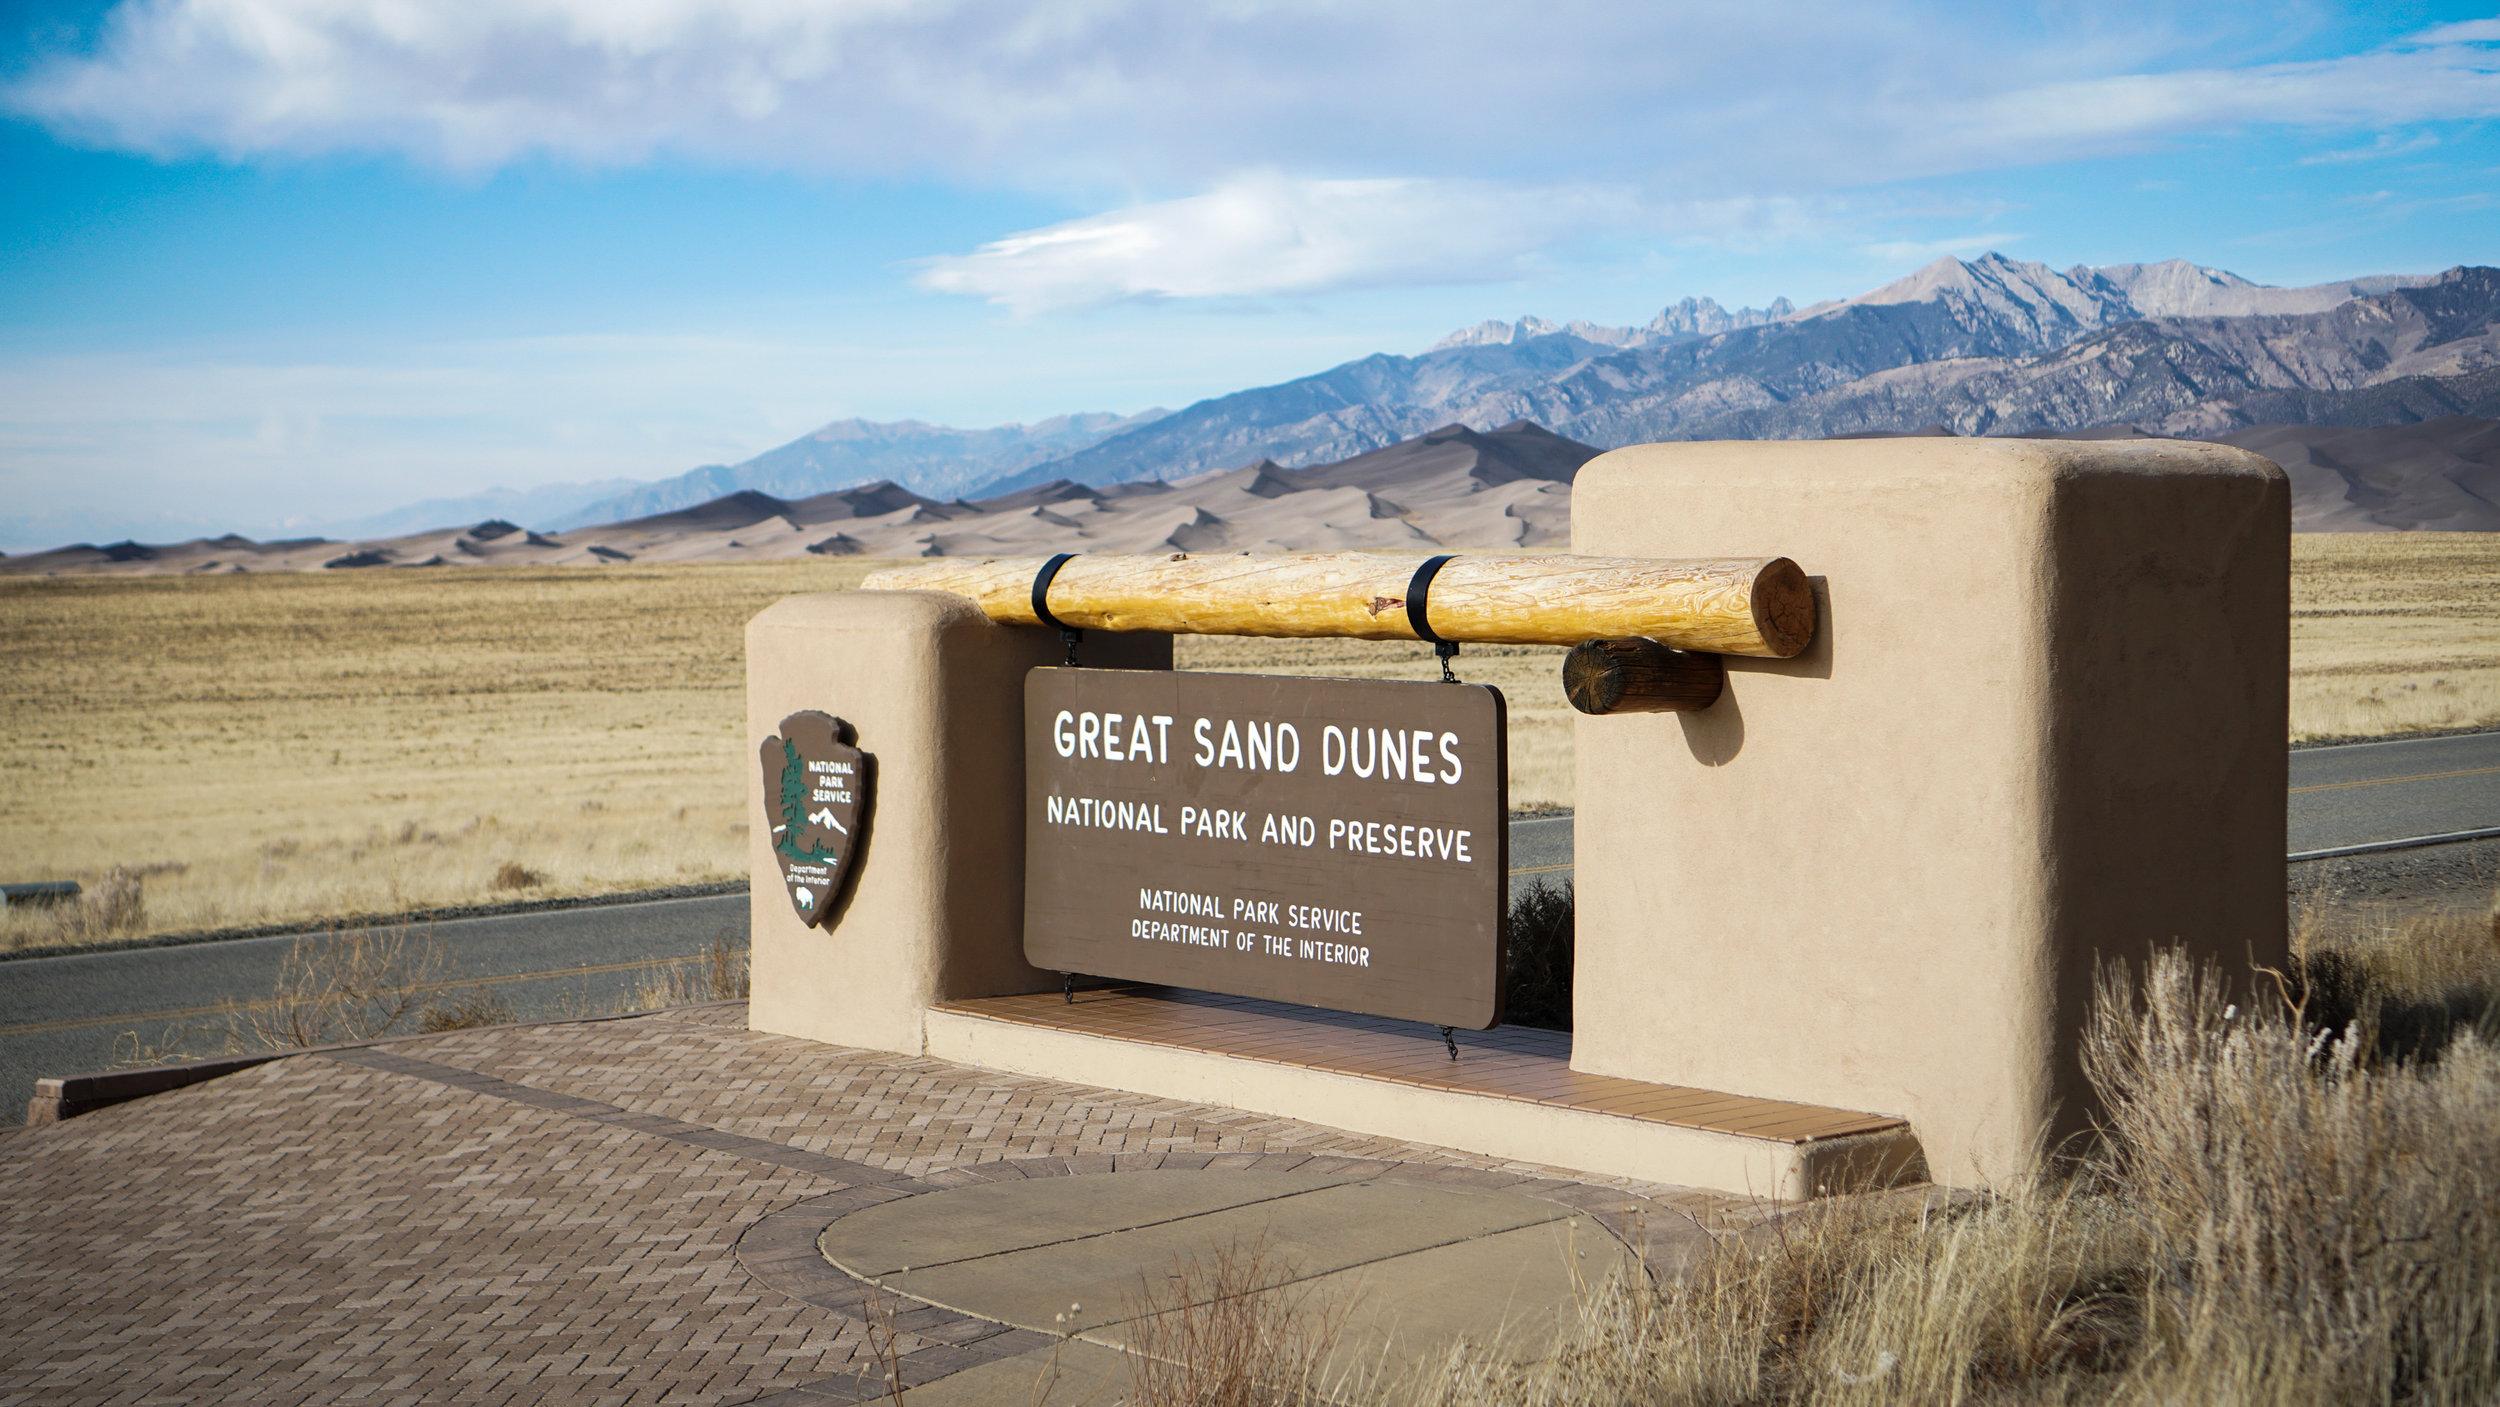 great-sand-dunes-national-park.jpg